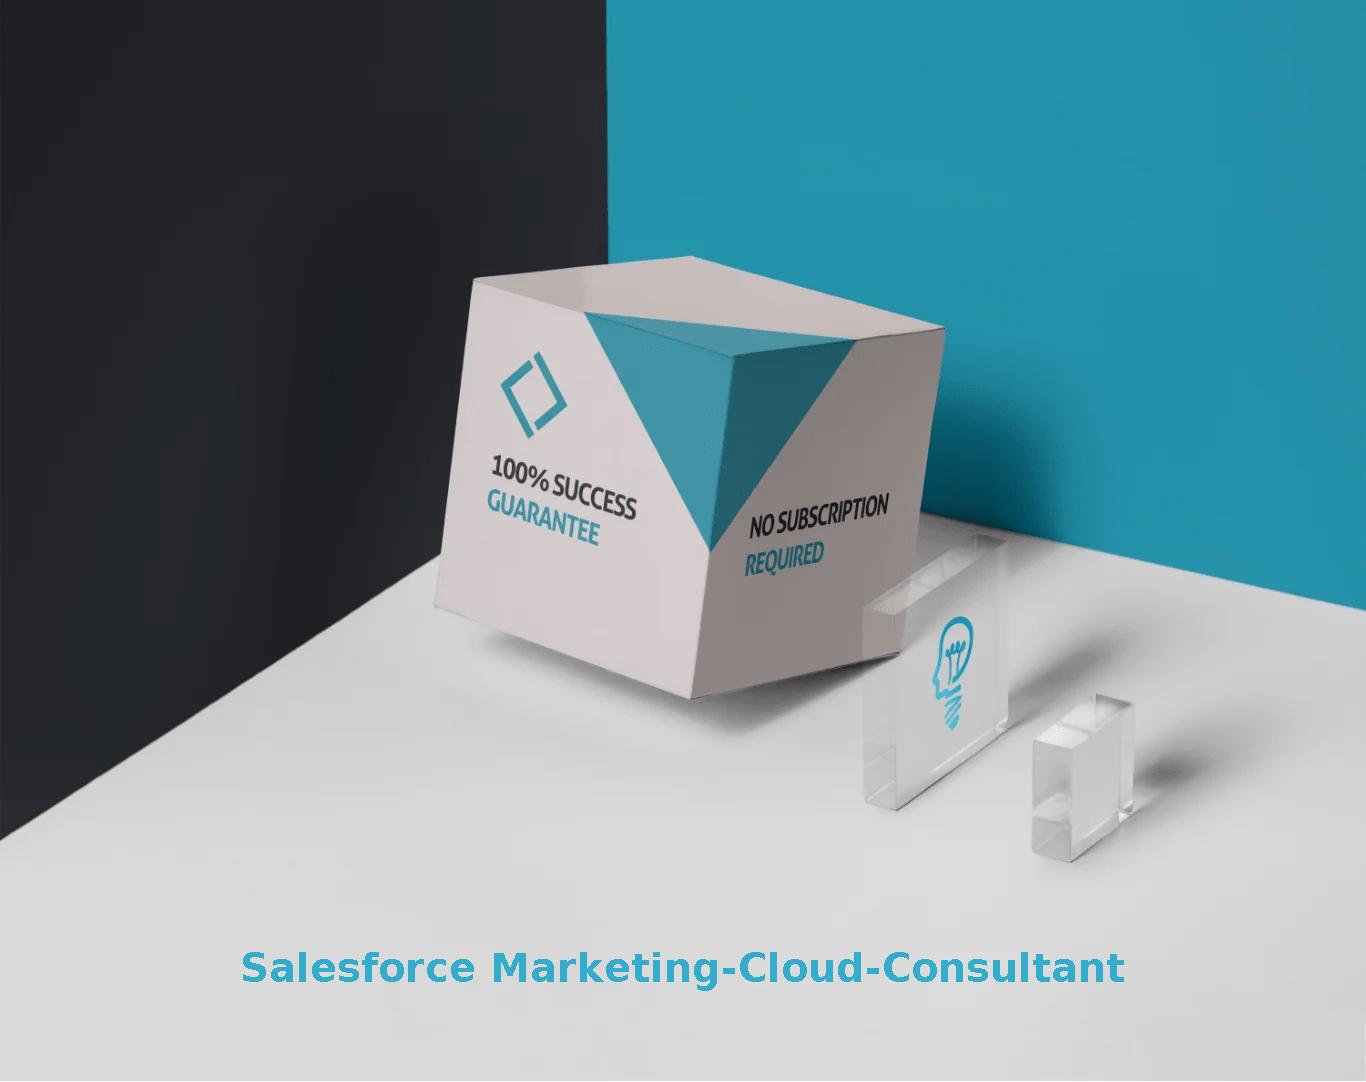 Marketing-Cloud-Consultant Dumps